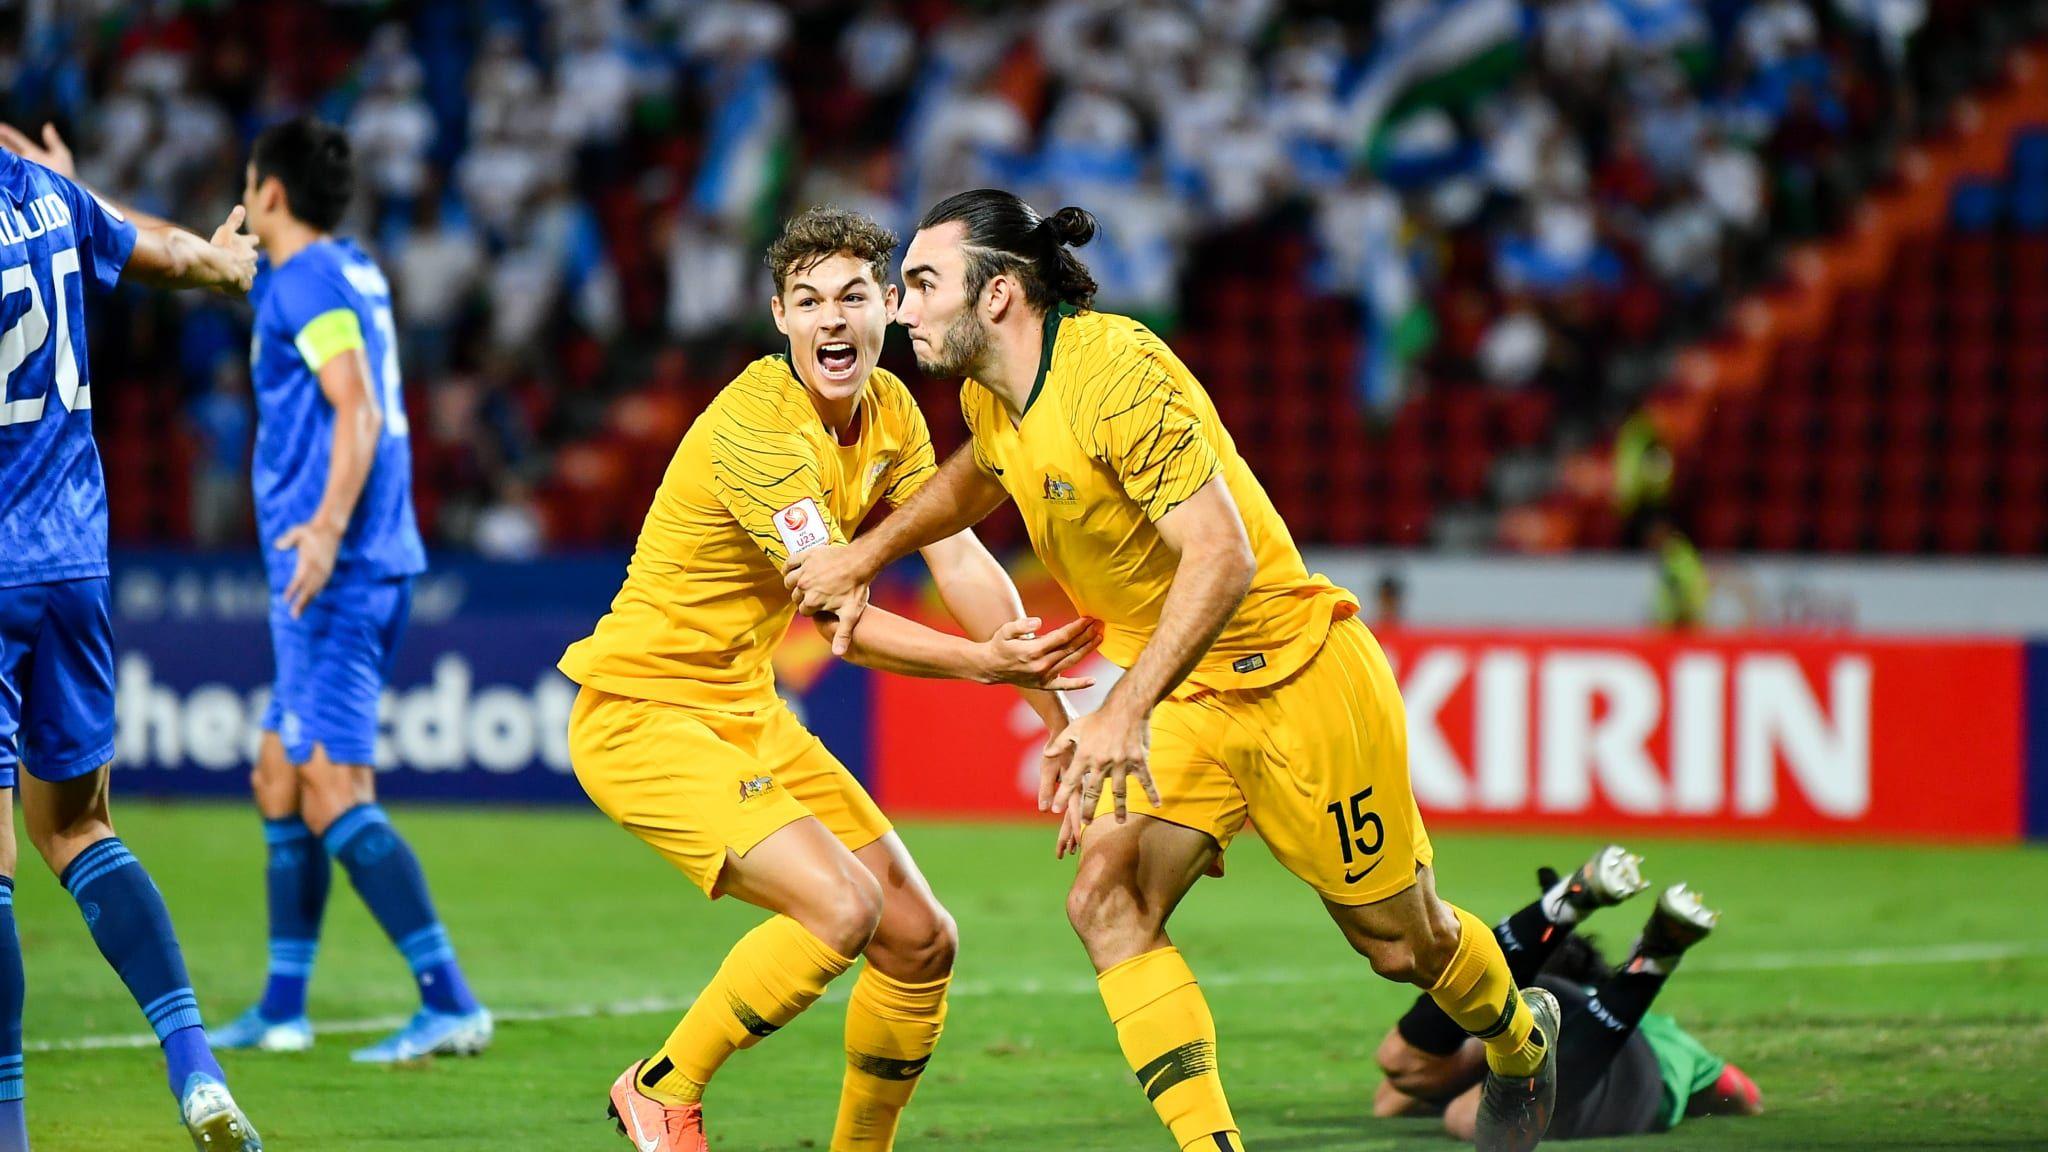 Olympic Football Tournaments 2020 Men News Australia book